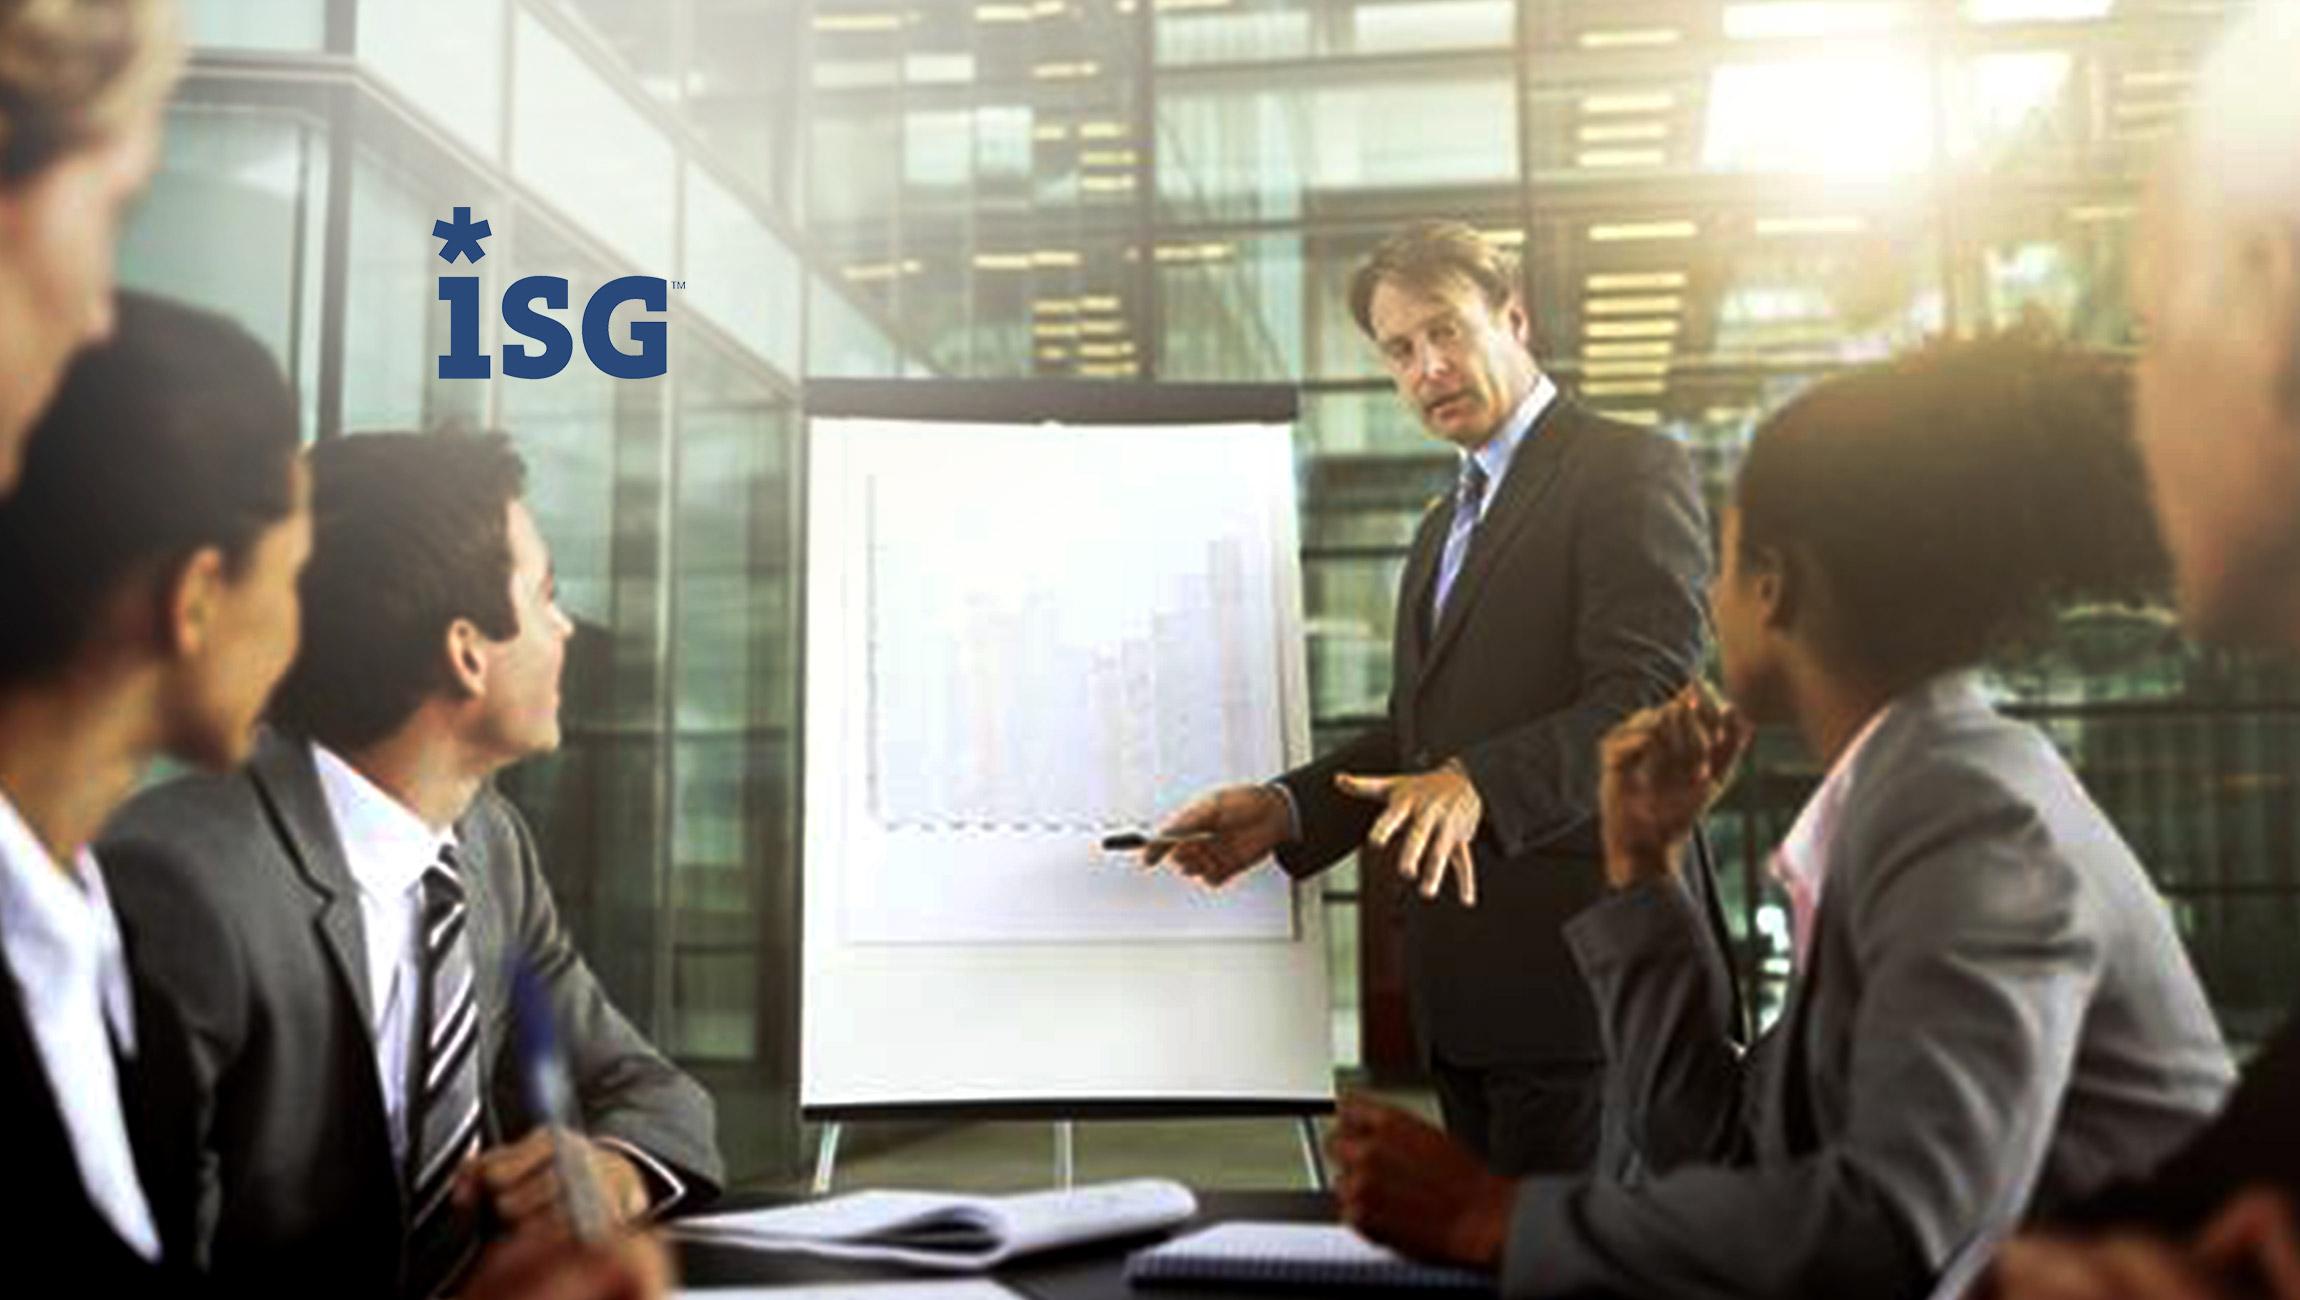 Digital Customer Experience Tops 2021 Agenda for BFSI